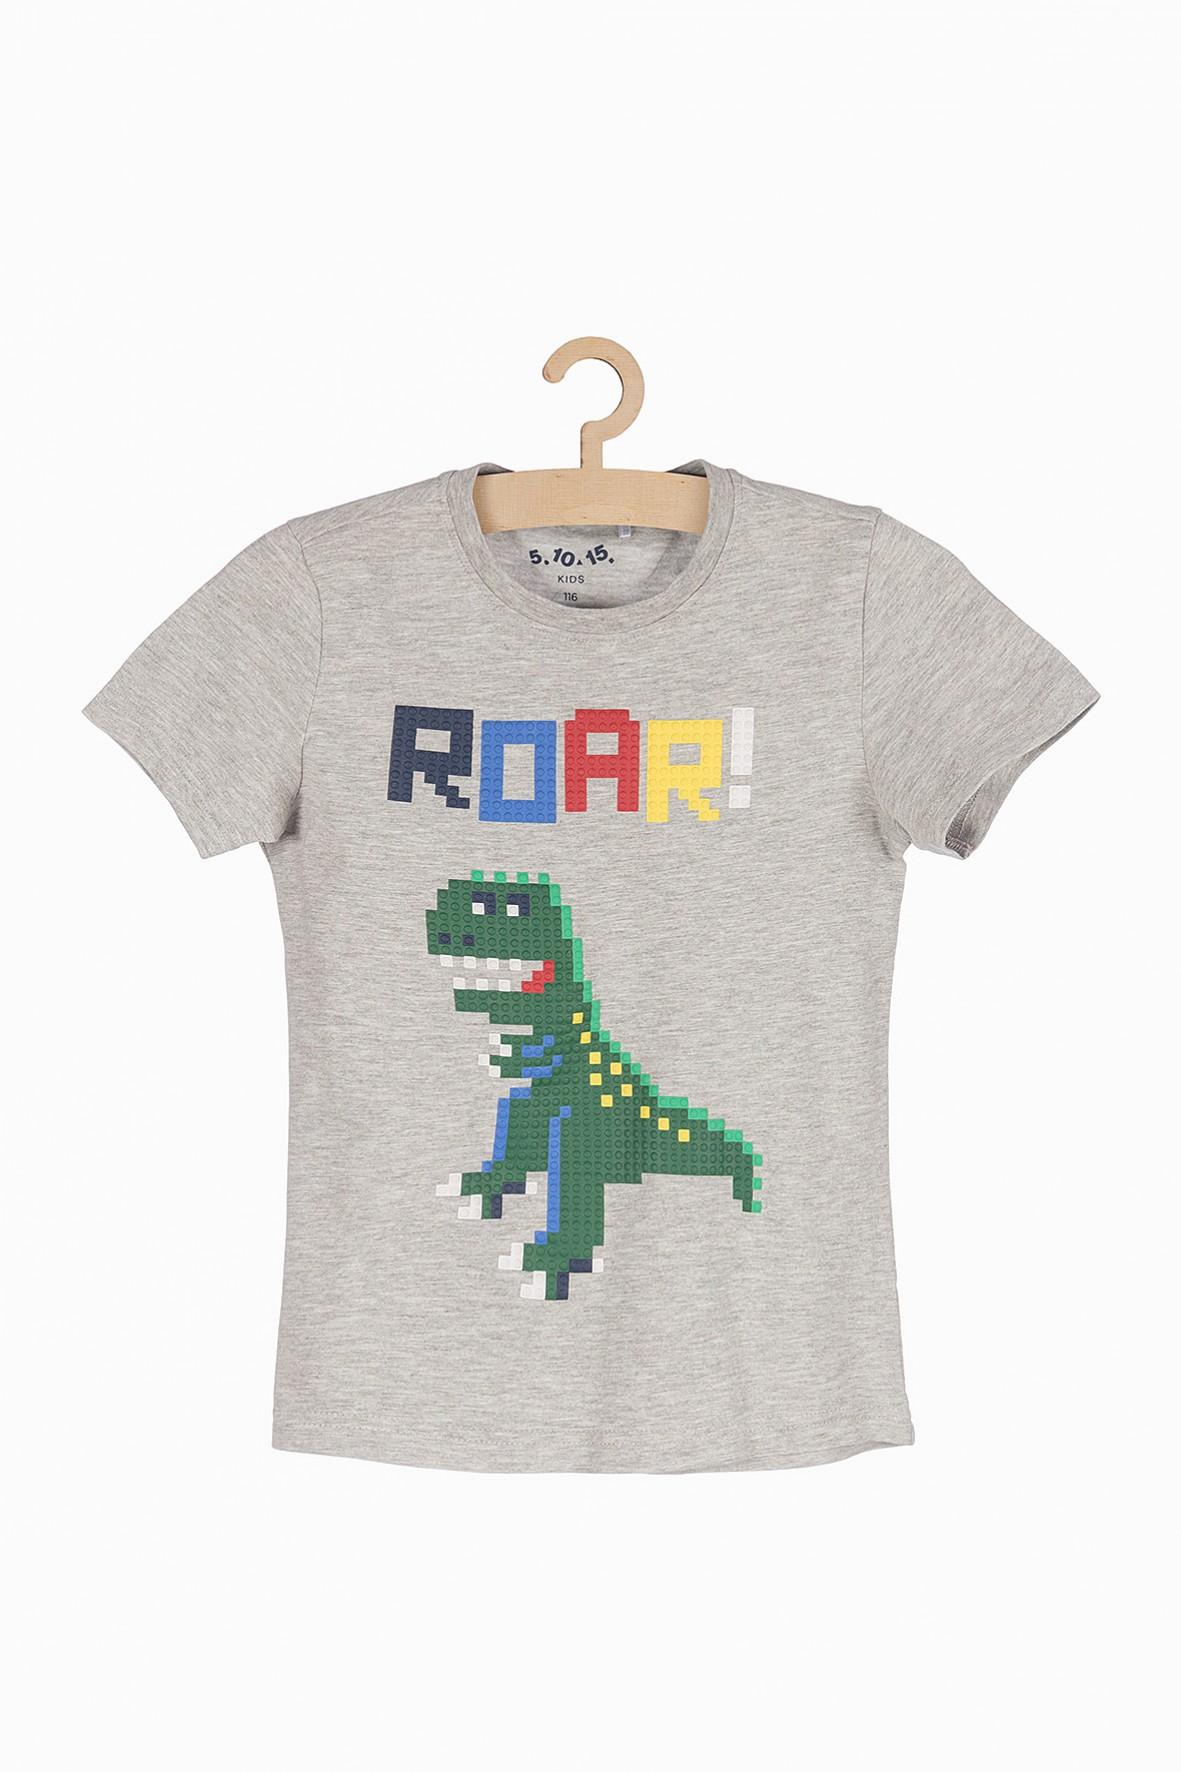 T-shirt chłopięcy z dinozaurem